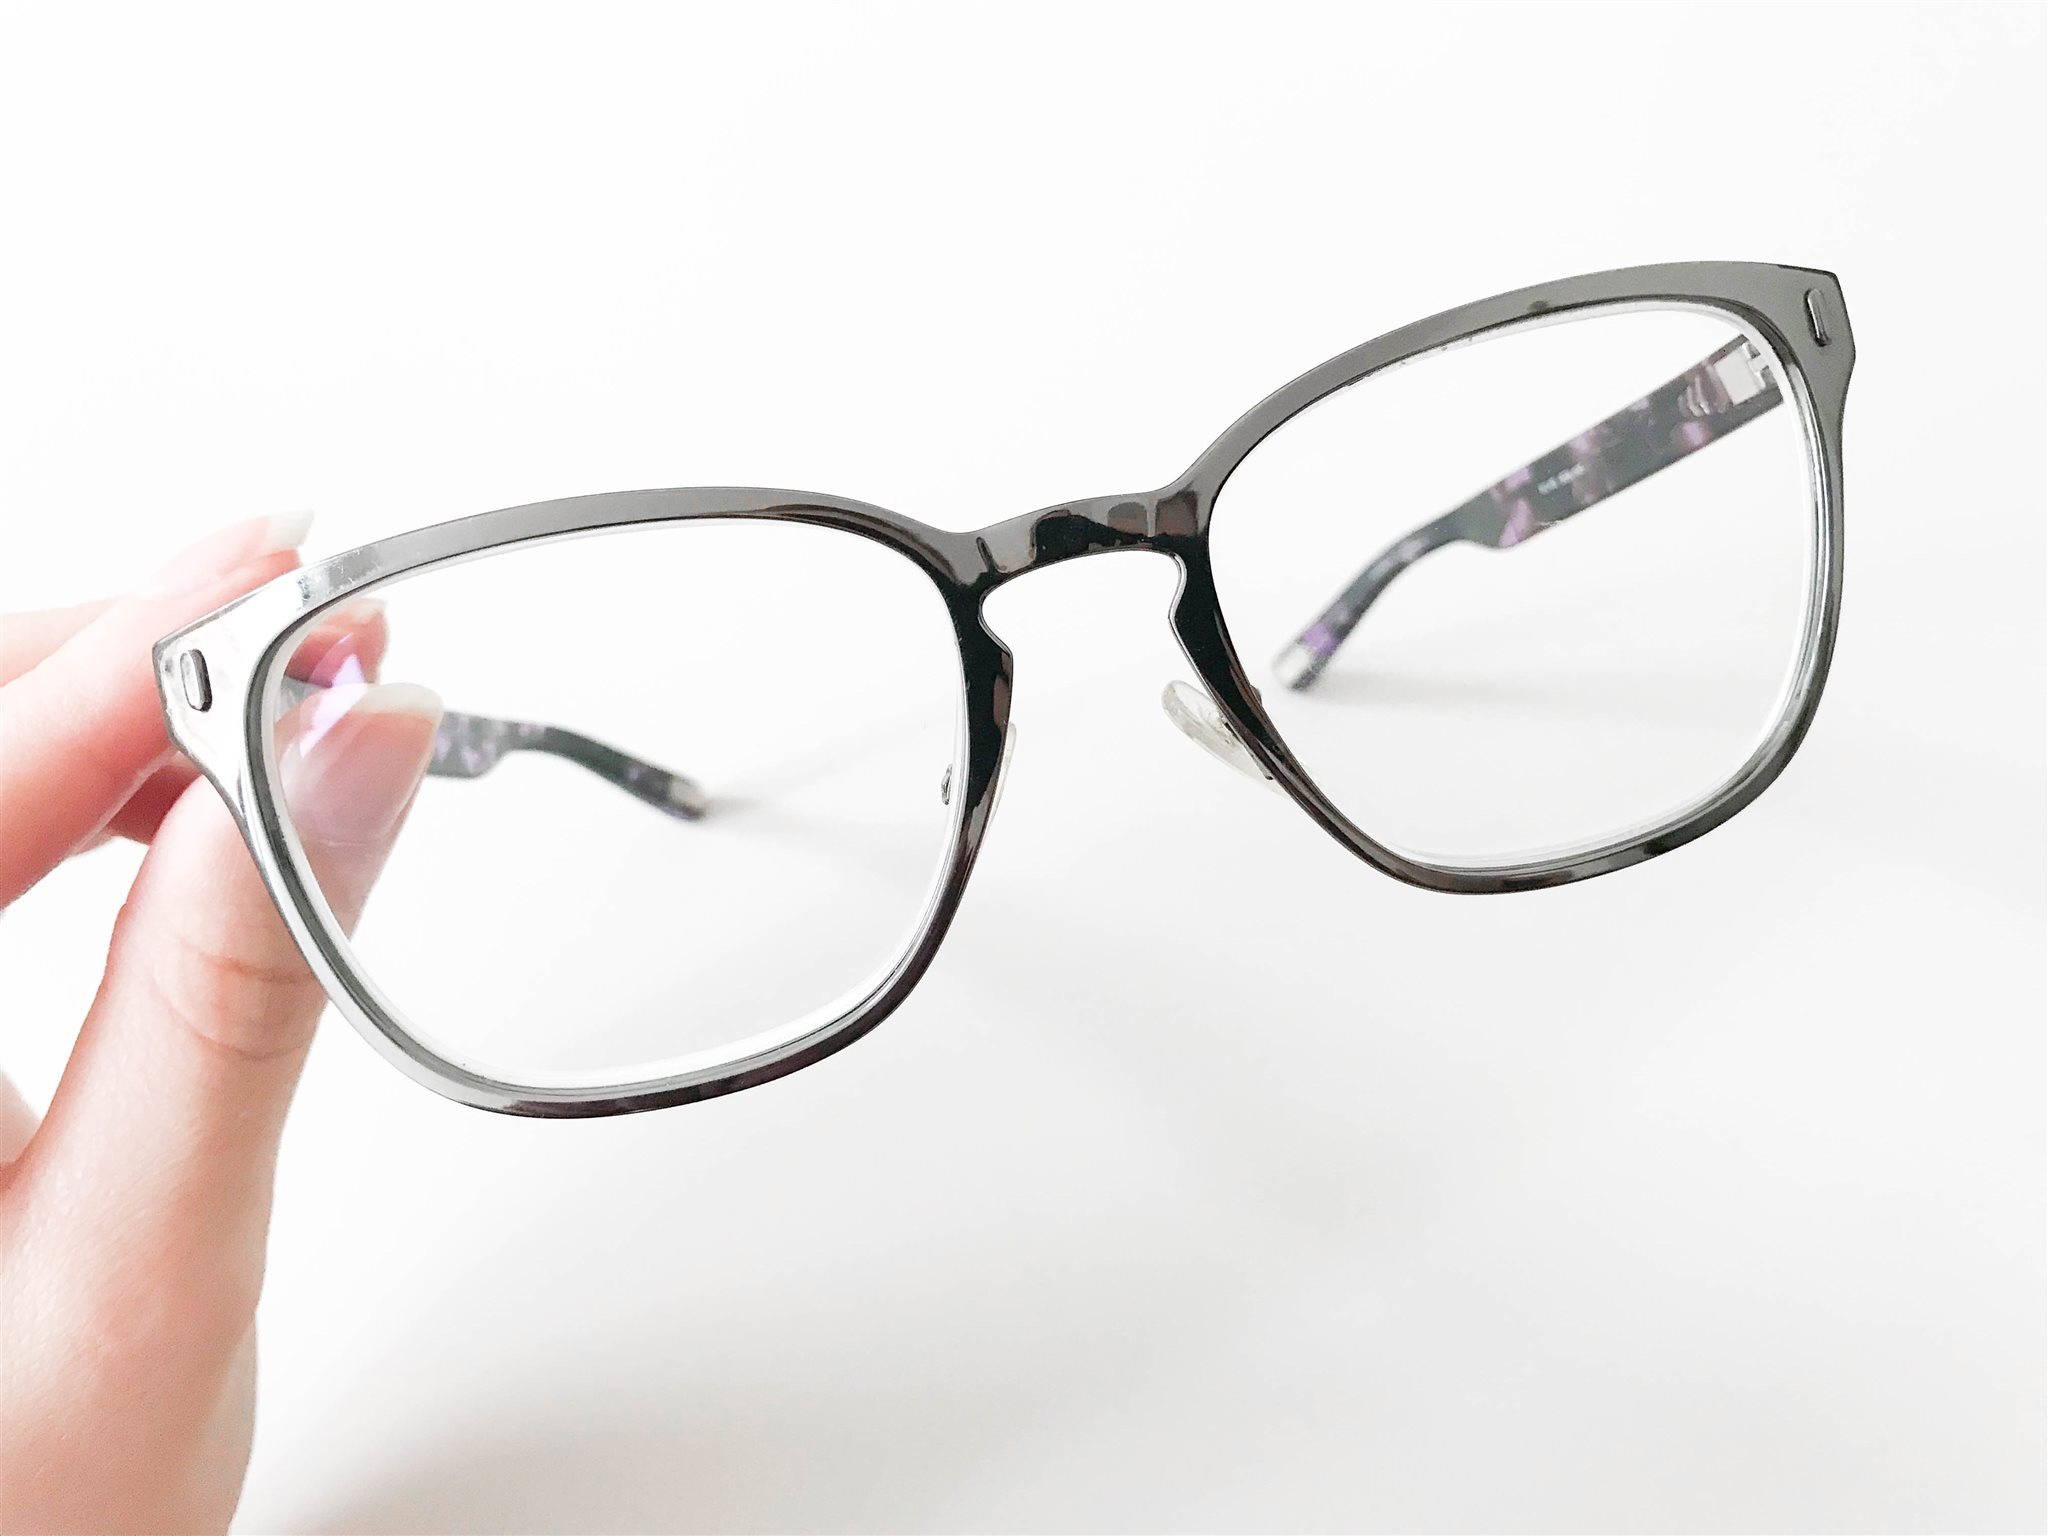 MARC JACOBS - Snygga glasögon - cateye fd7f7feee1bc9